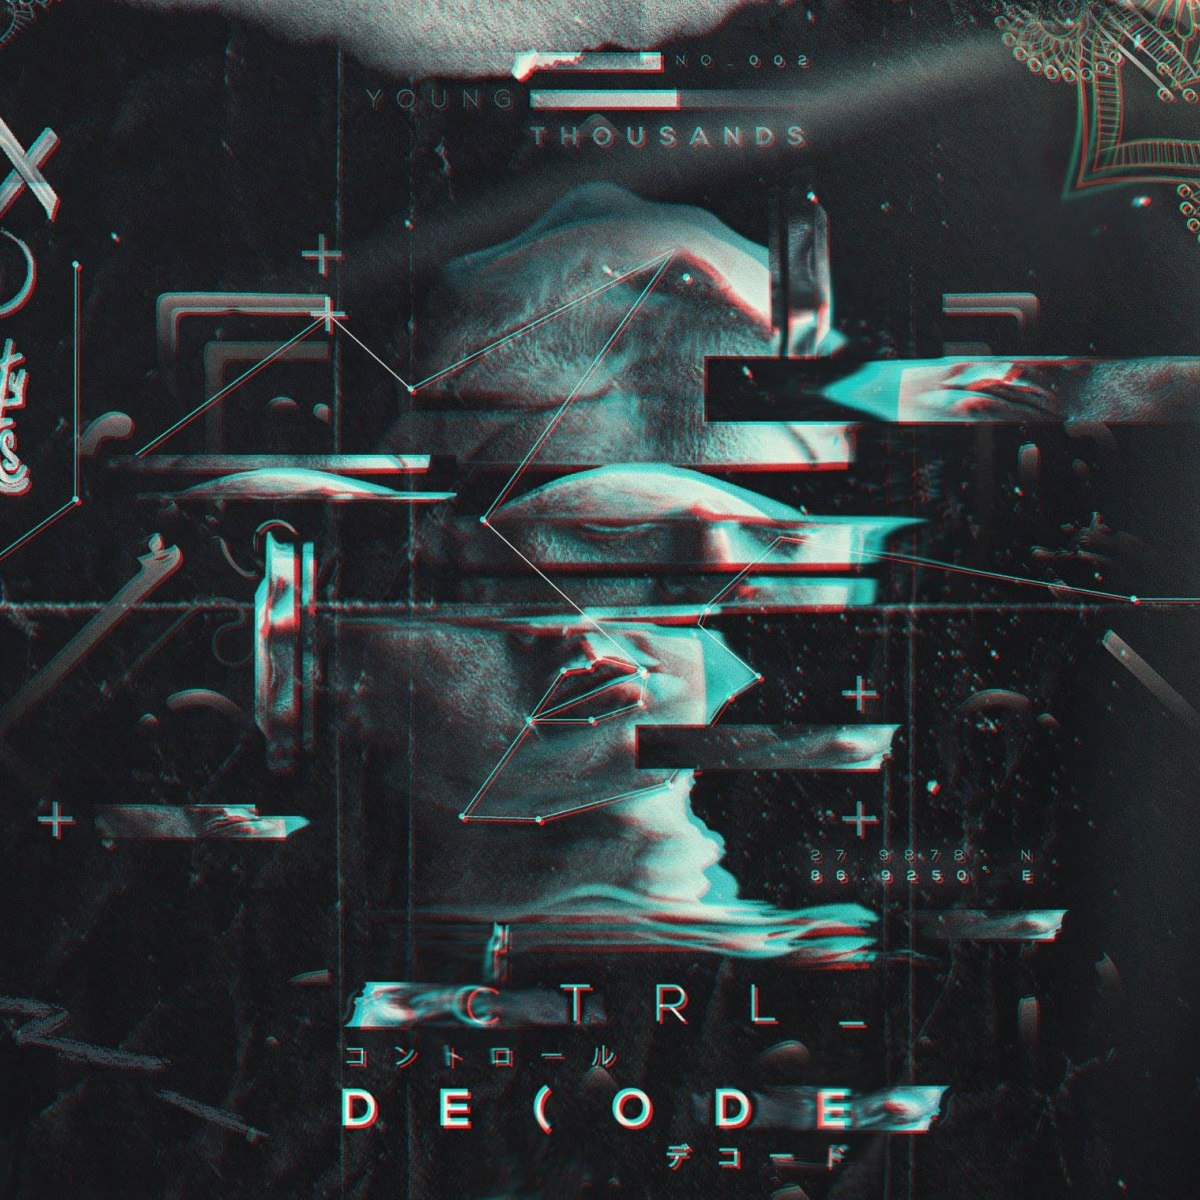 Young Thousands - ctrl_decode [single] (2017)